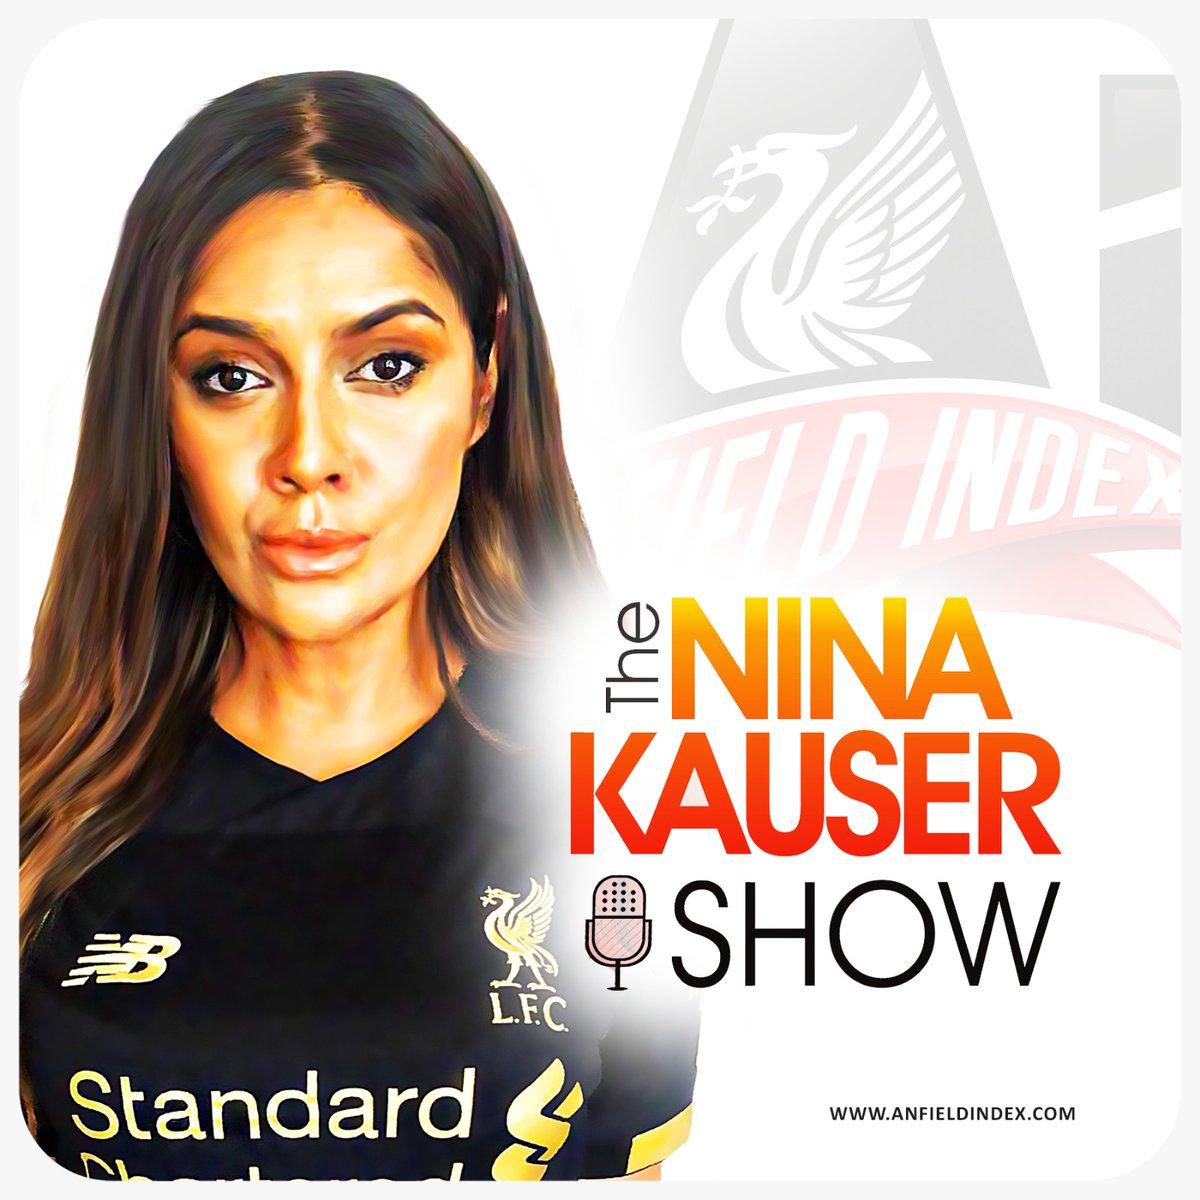 The @NinaKauser Show: #BHALIV  With: @armandoangulo12& @RollsonShabbos  Listen: